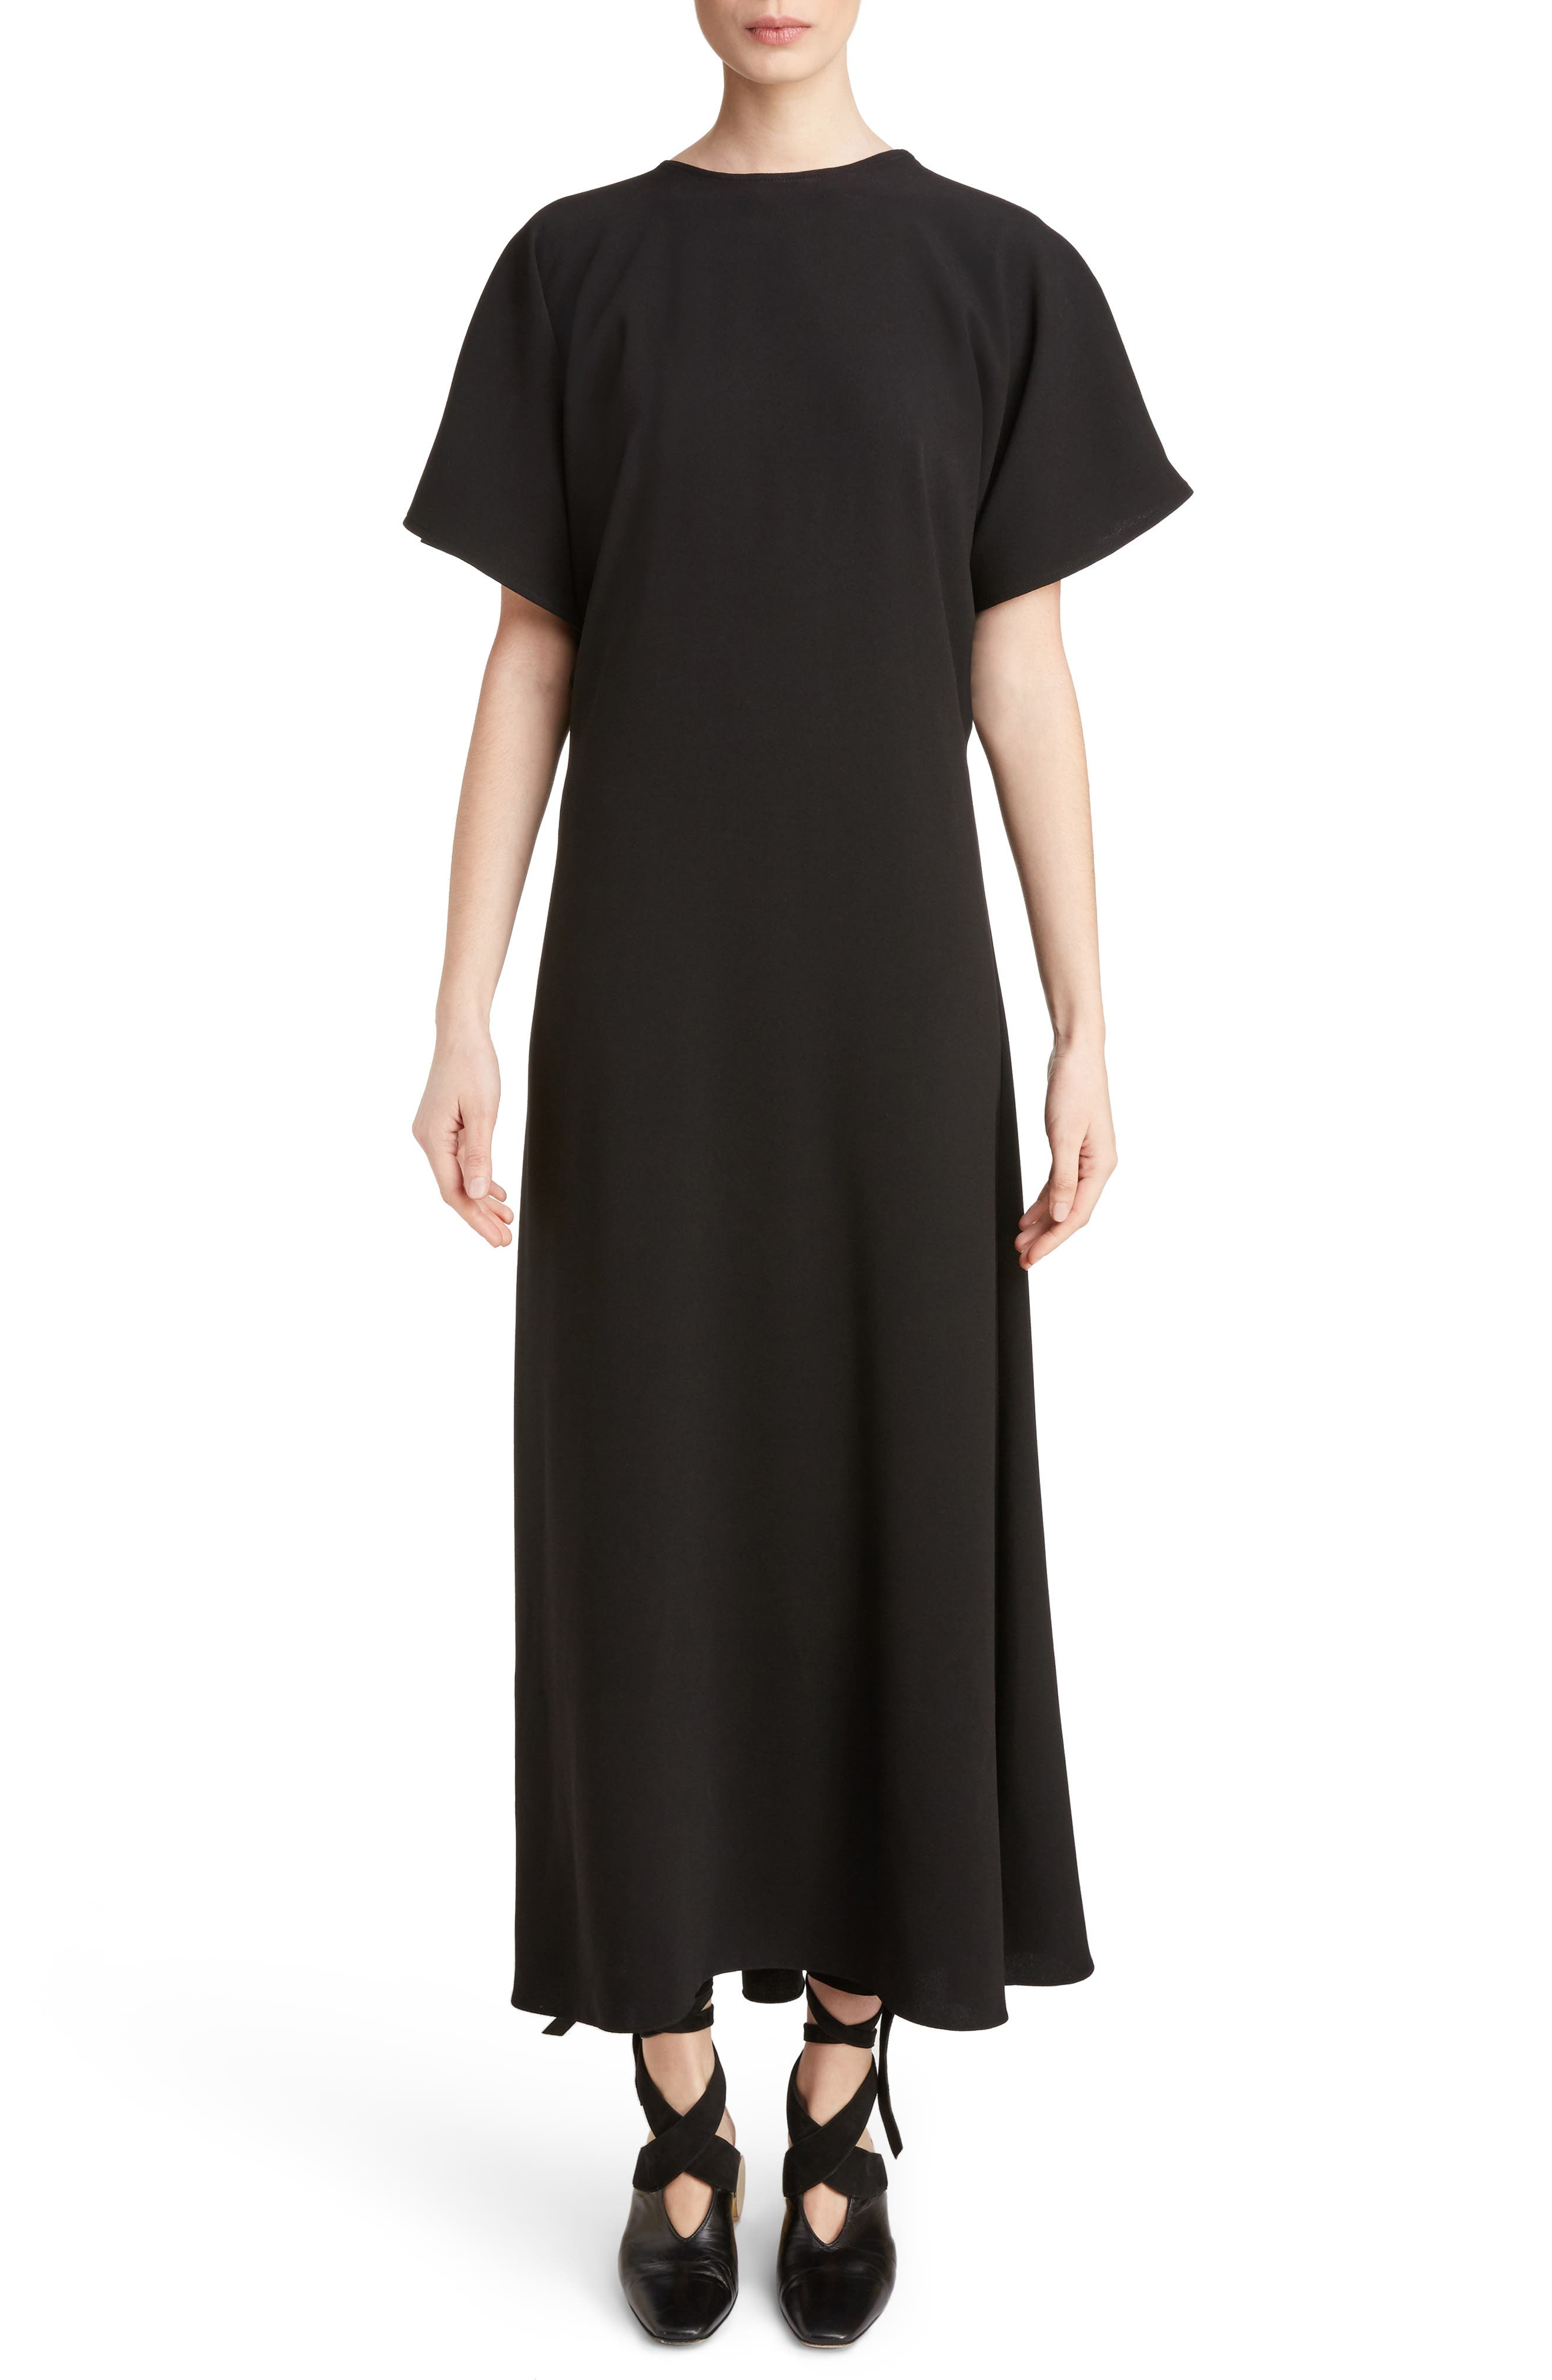 Main Image - J.W.ANDERSON Cap Sleeve Maxi Dress